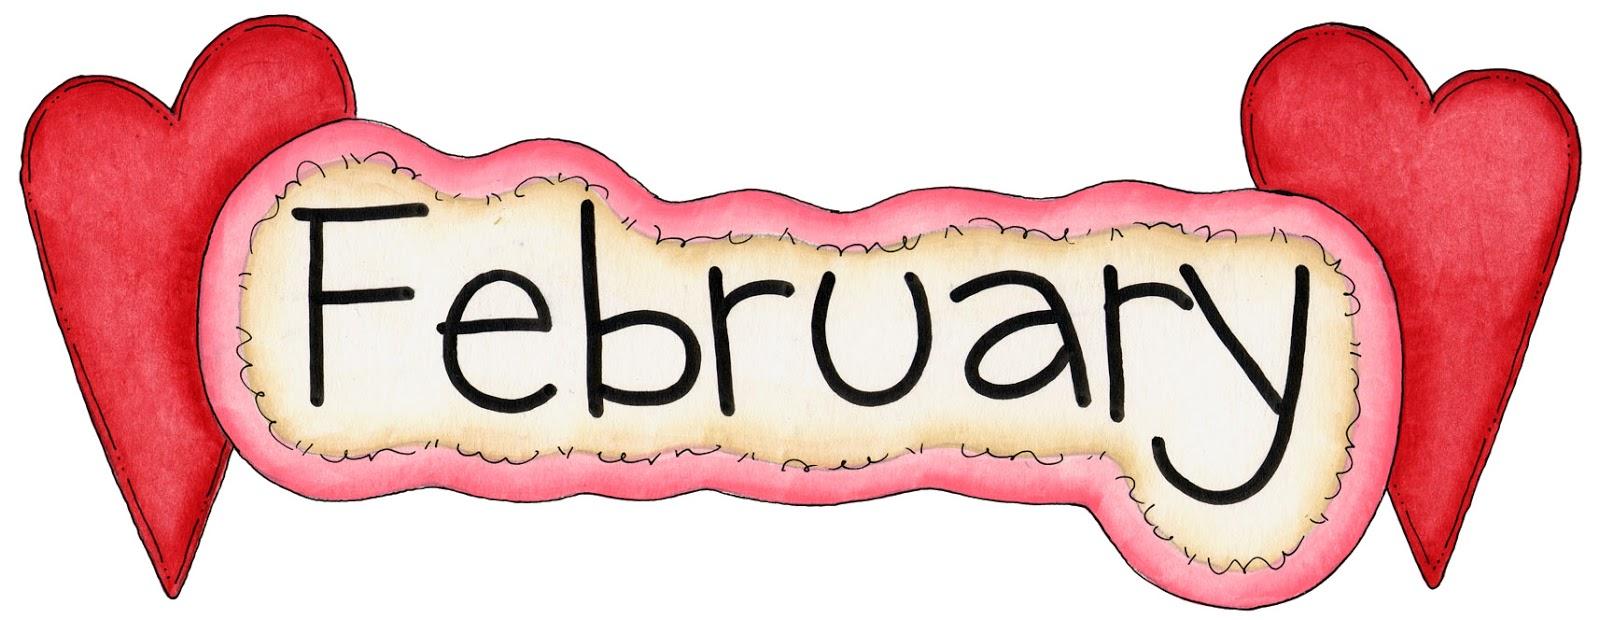 February clip art images .